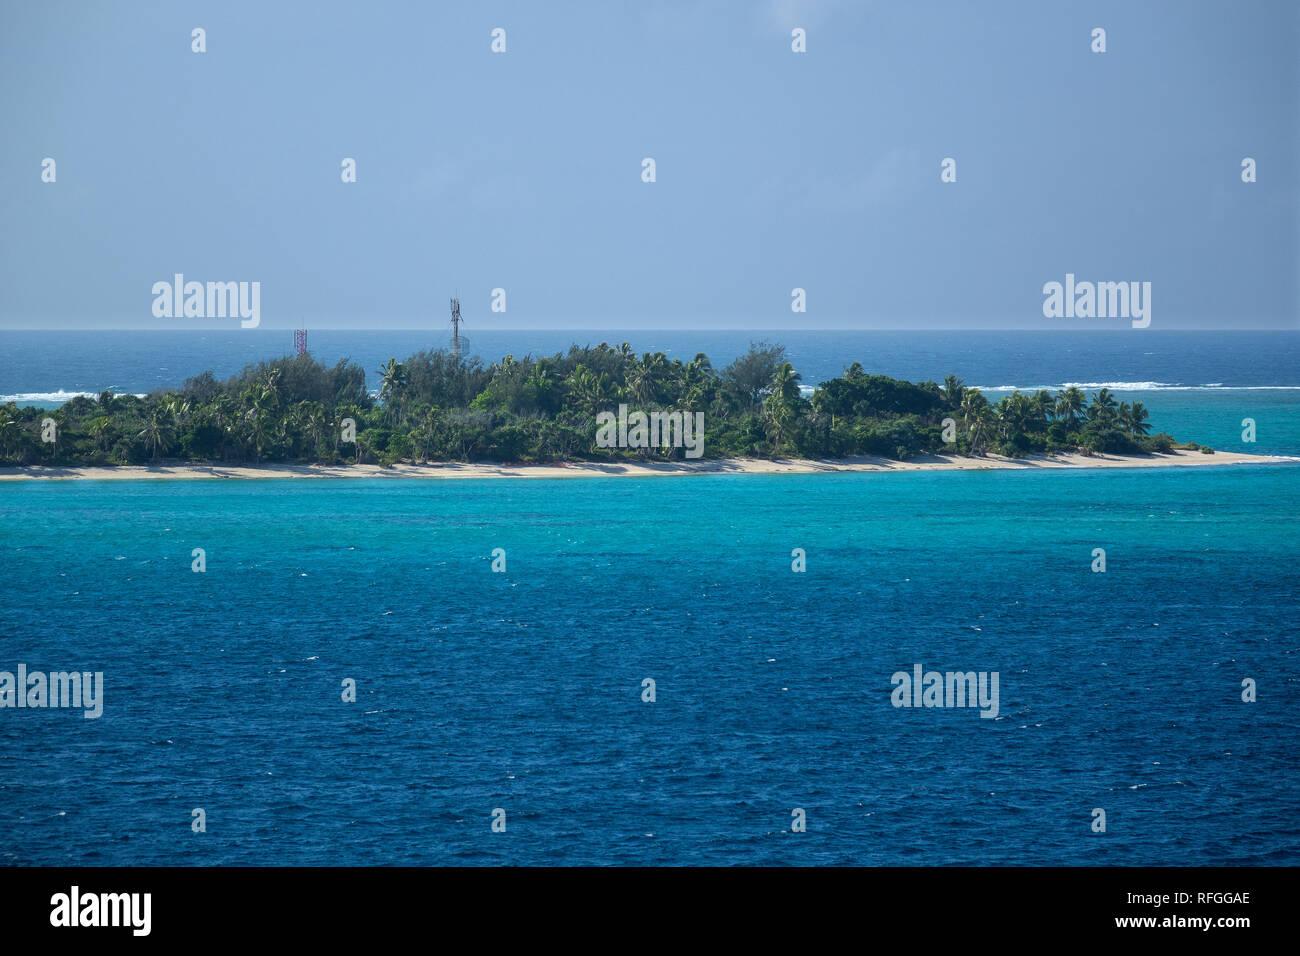 Vanuatu, Aneityum island, Mystery island - Stock Image